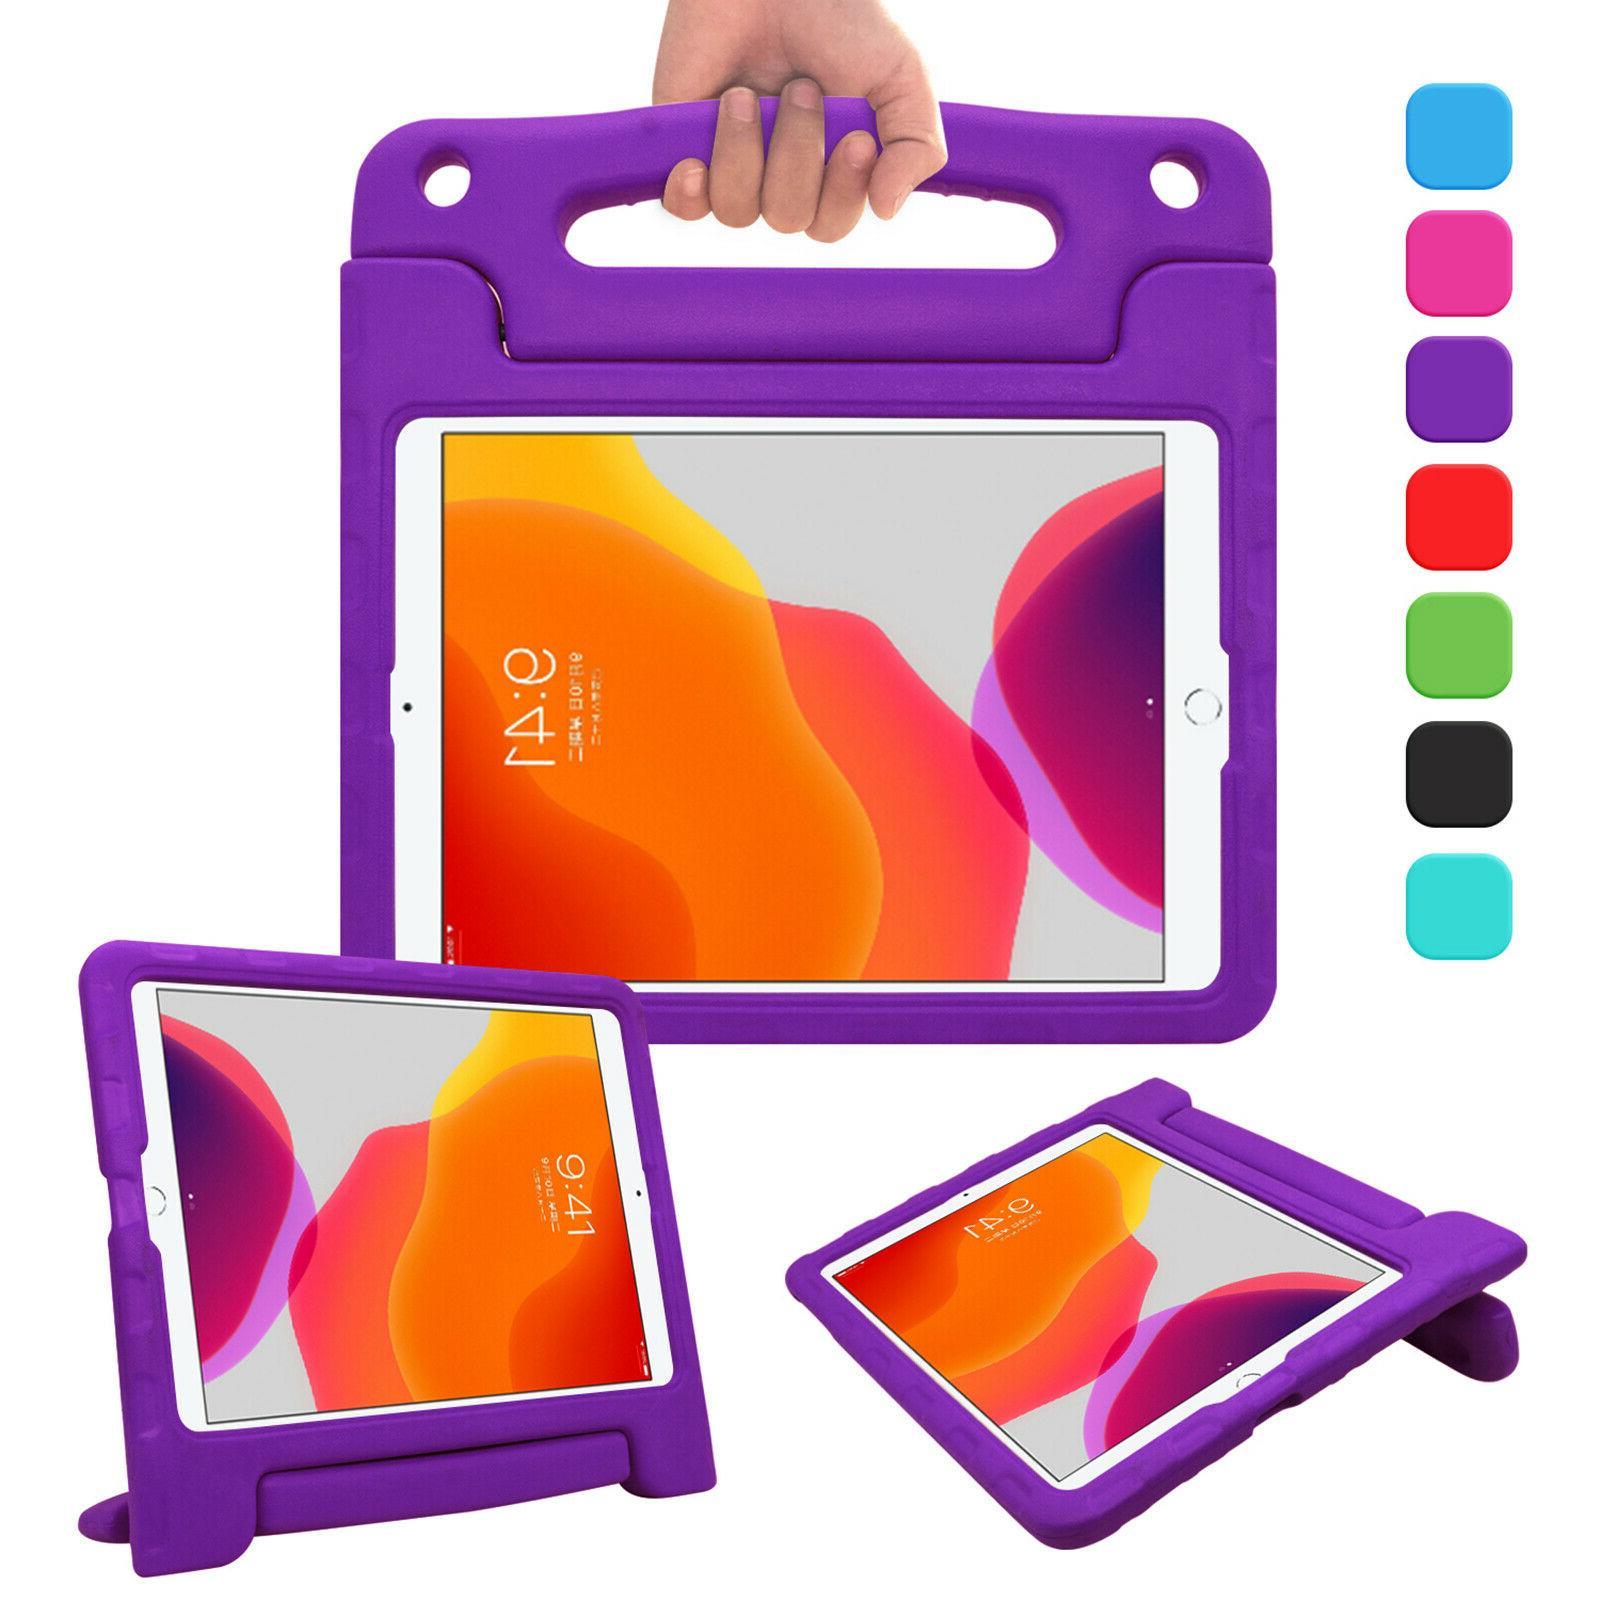 "iPad Case 10.2"" 2019 Handle Cover"